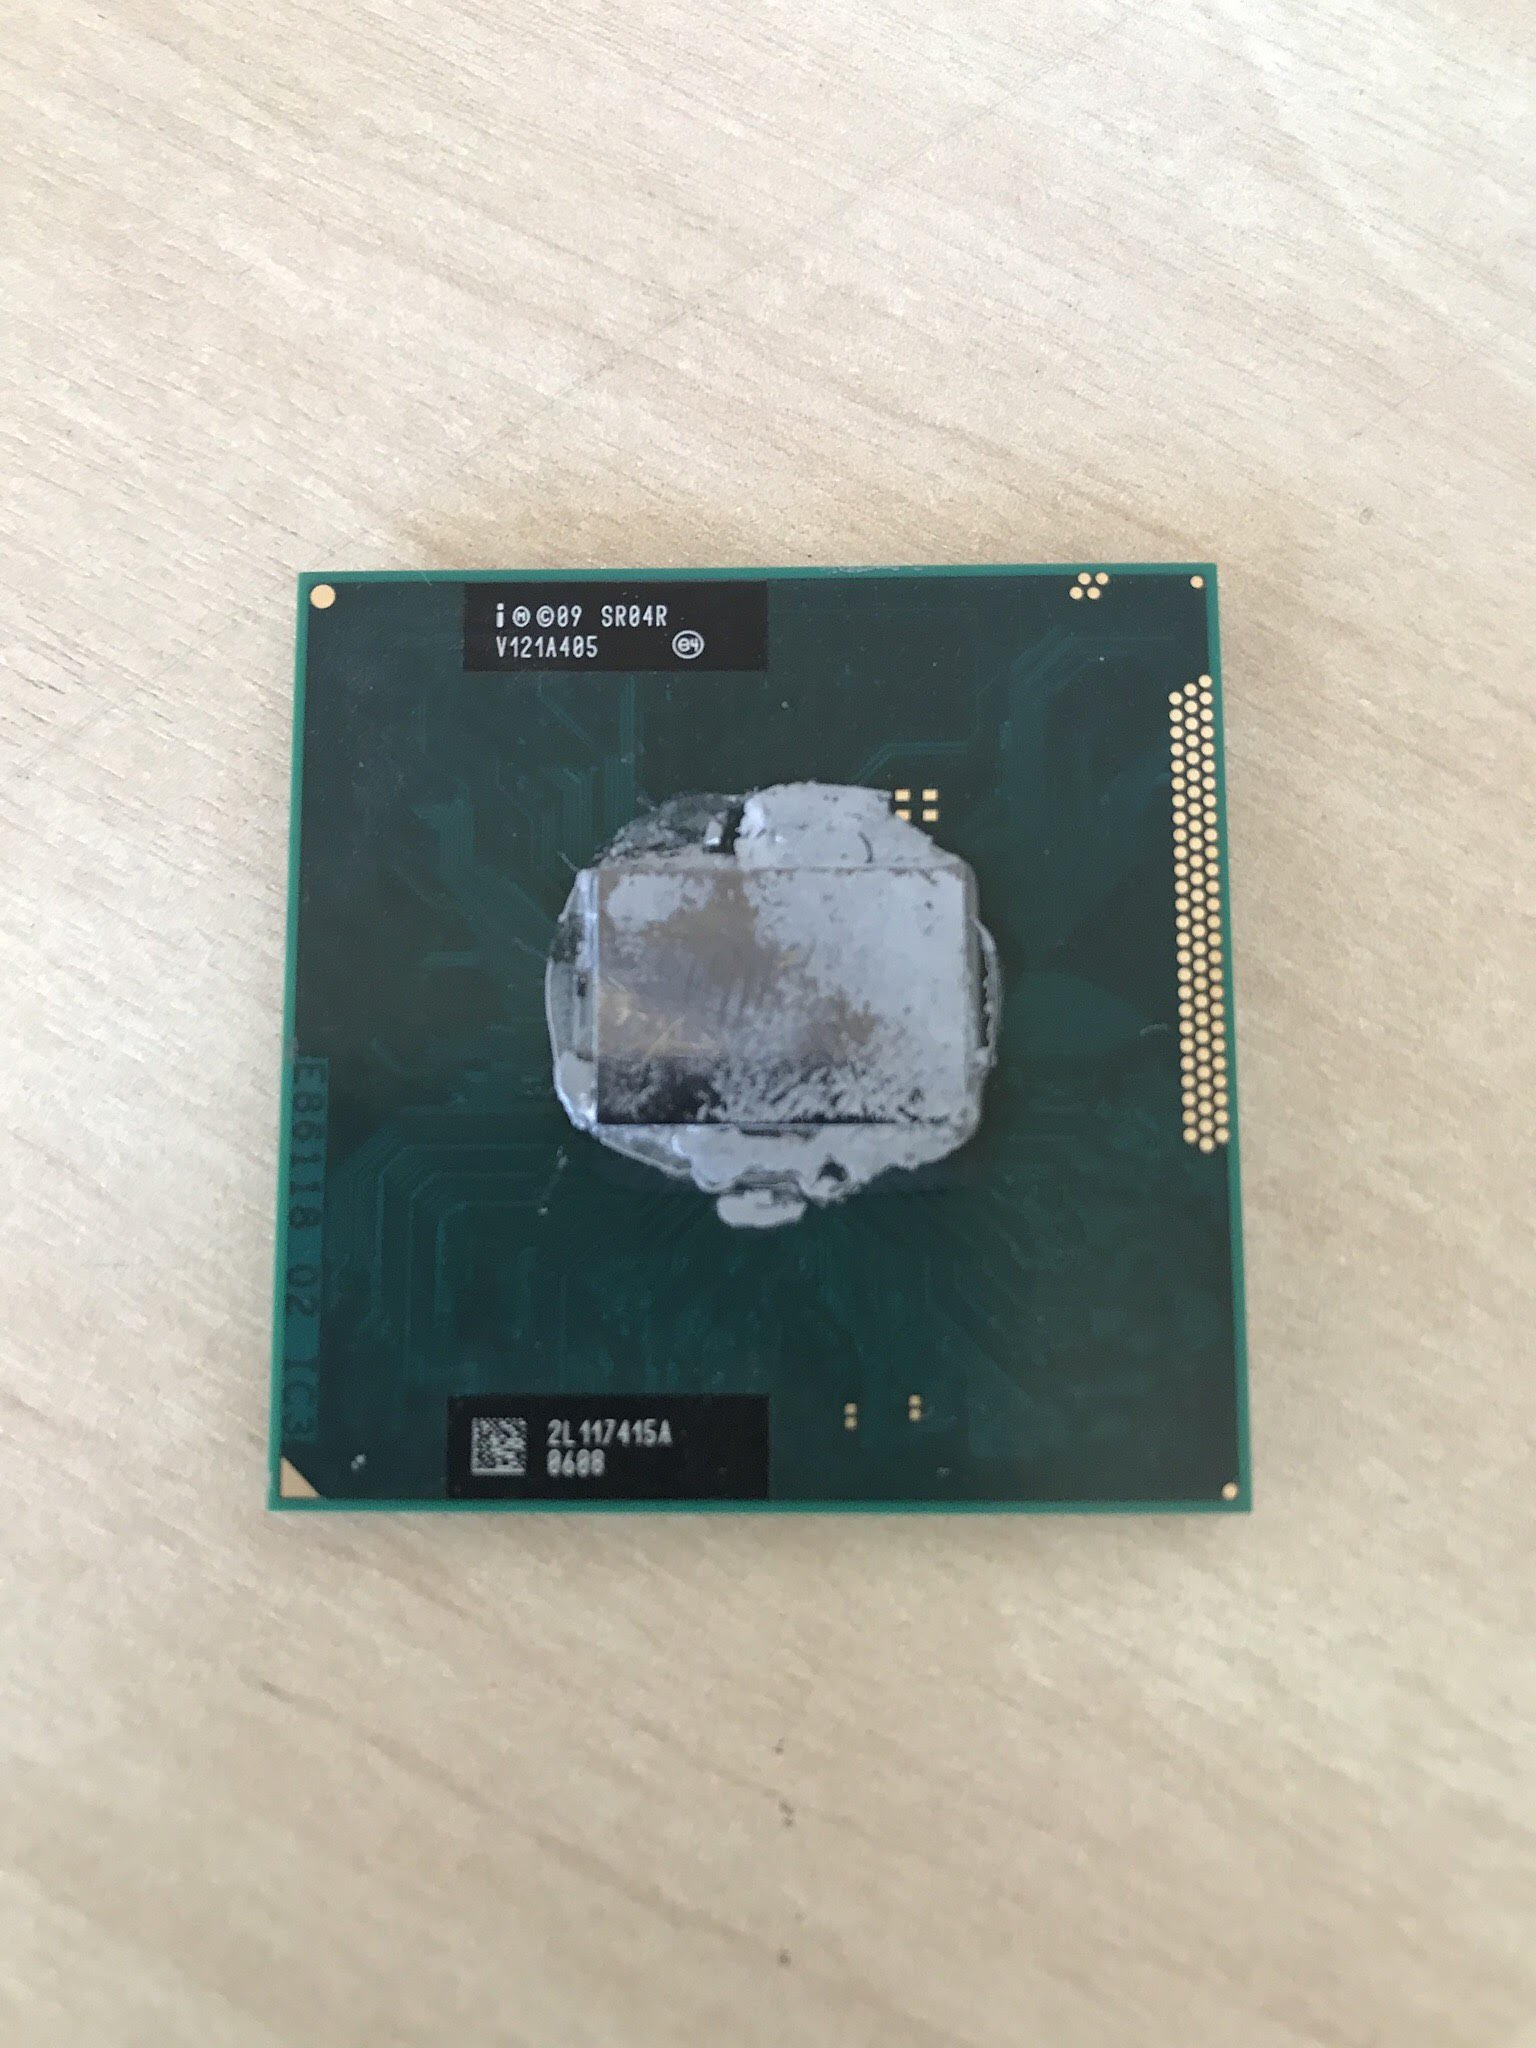 Intel Core i3-2310M SR04R 2.1GHz 3MB Dual-core Mobile CPU Processor Socket G2 988-pin by Intel (Image #2)